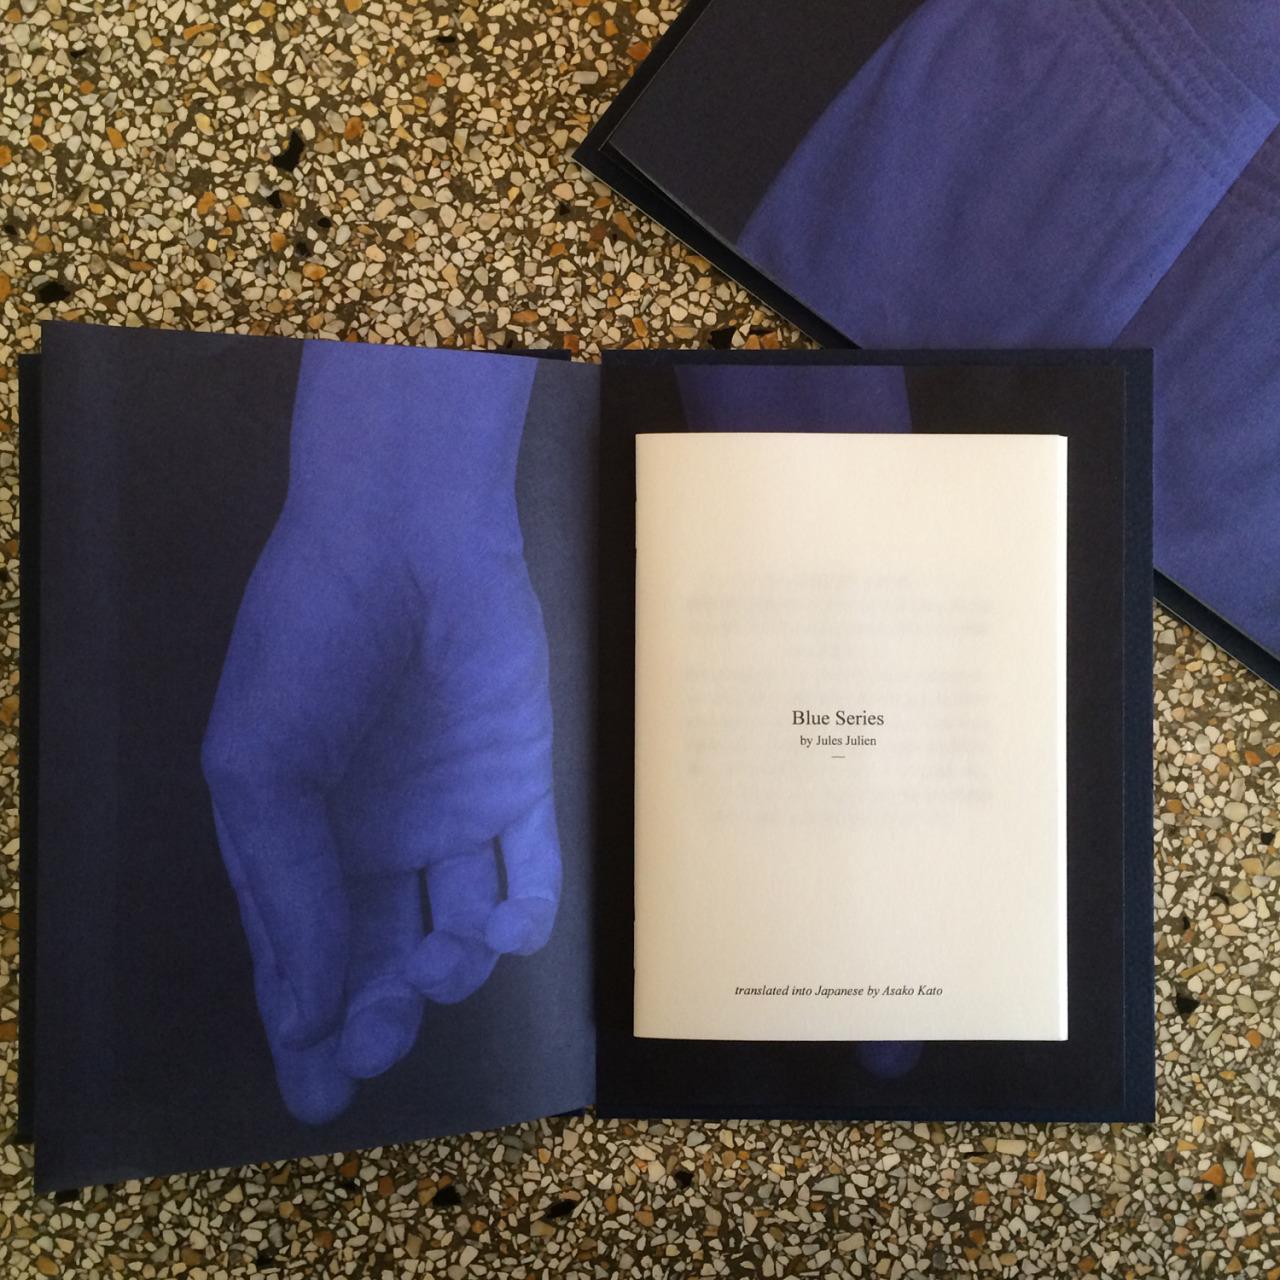 Blue Series by Jules Julien